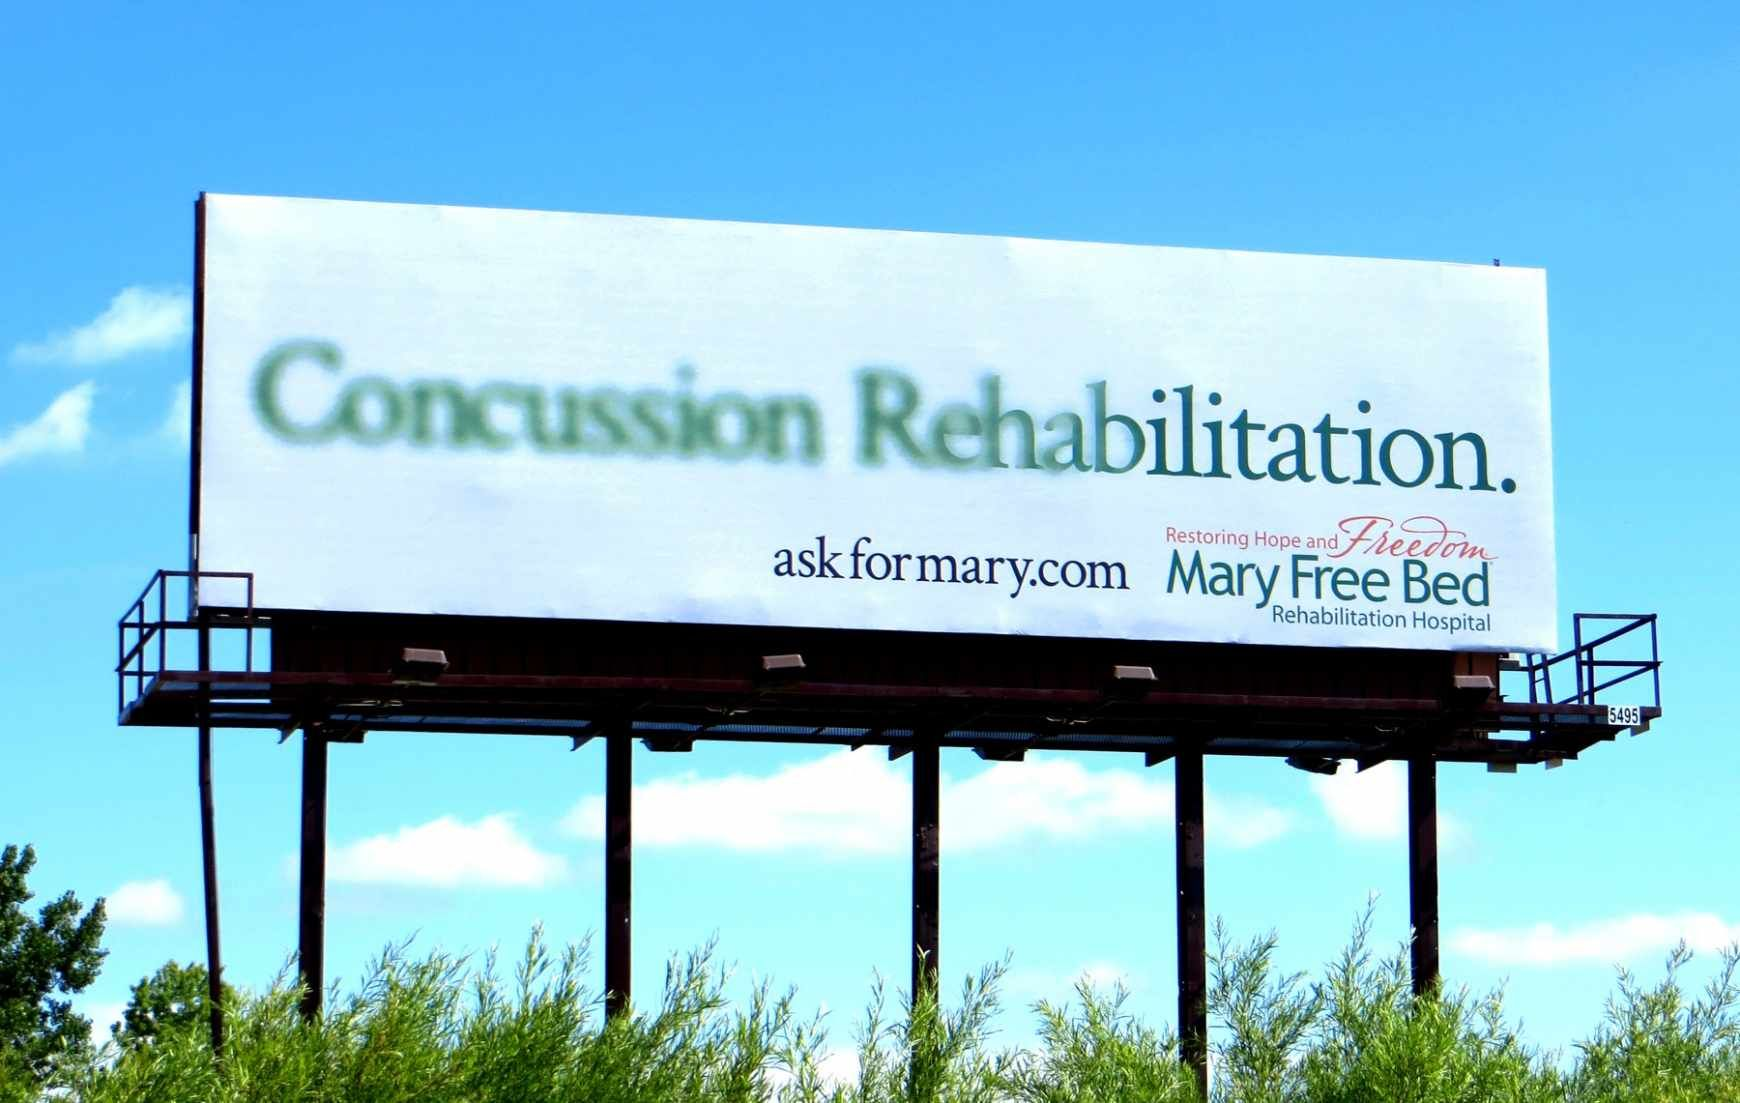 Mary Free Bed Rehabilitation Hospital Concussion